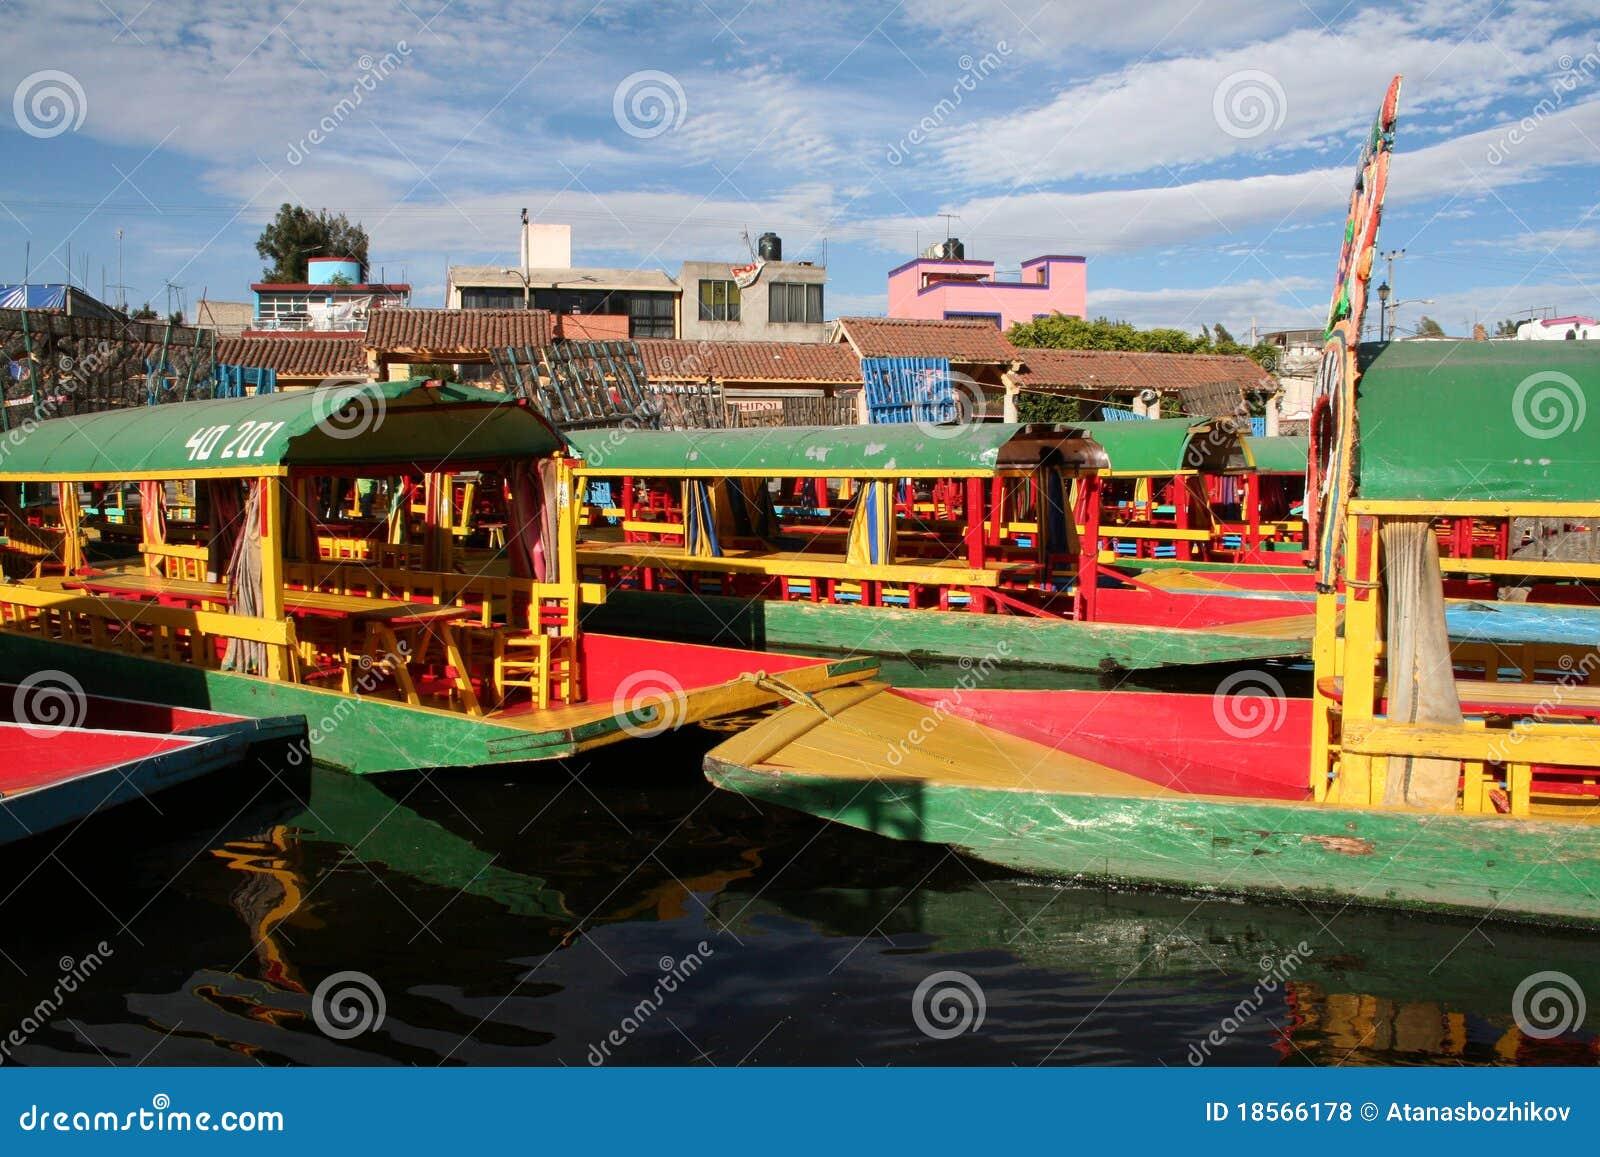 The floating garden Xochimilco in Mexico City